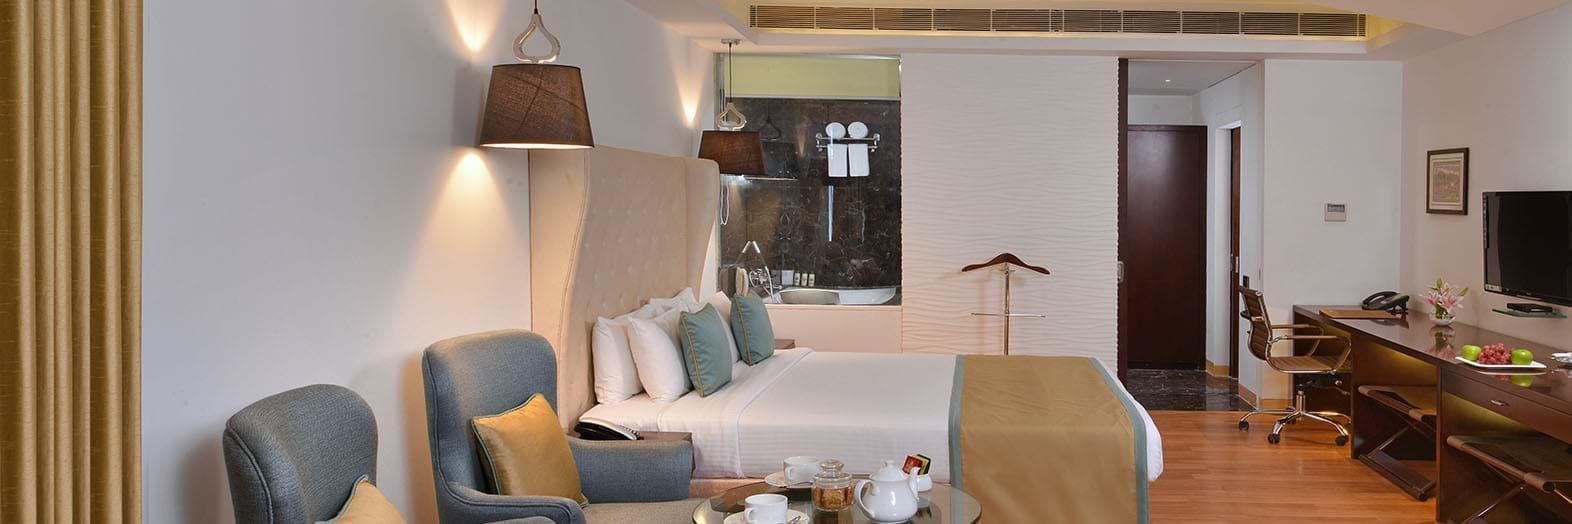 Hotel offers in Bhubaneswar